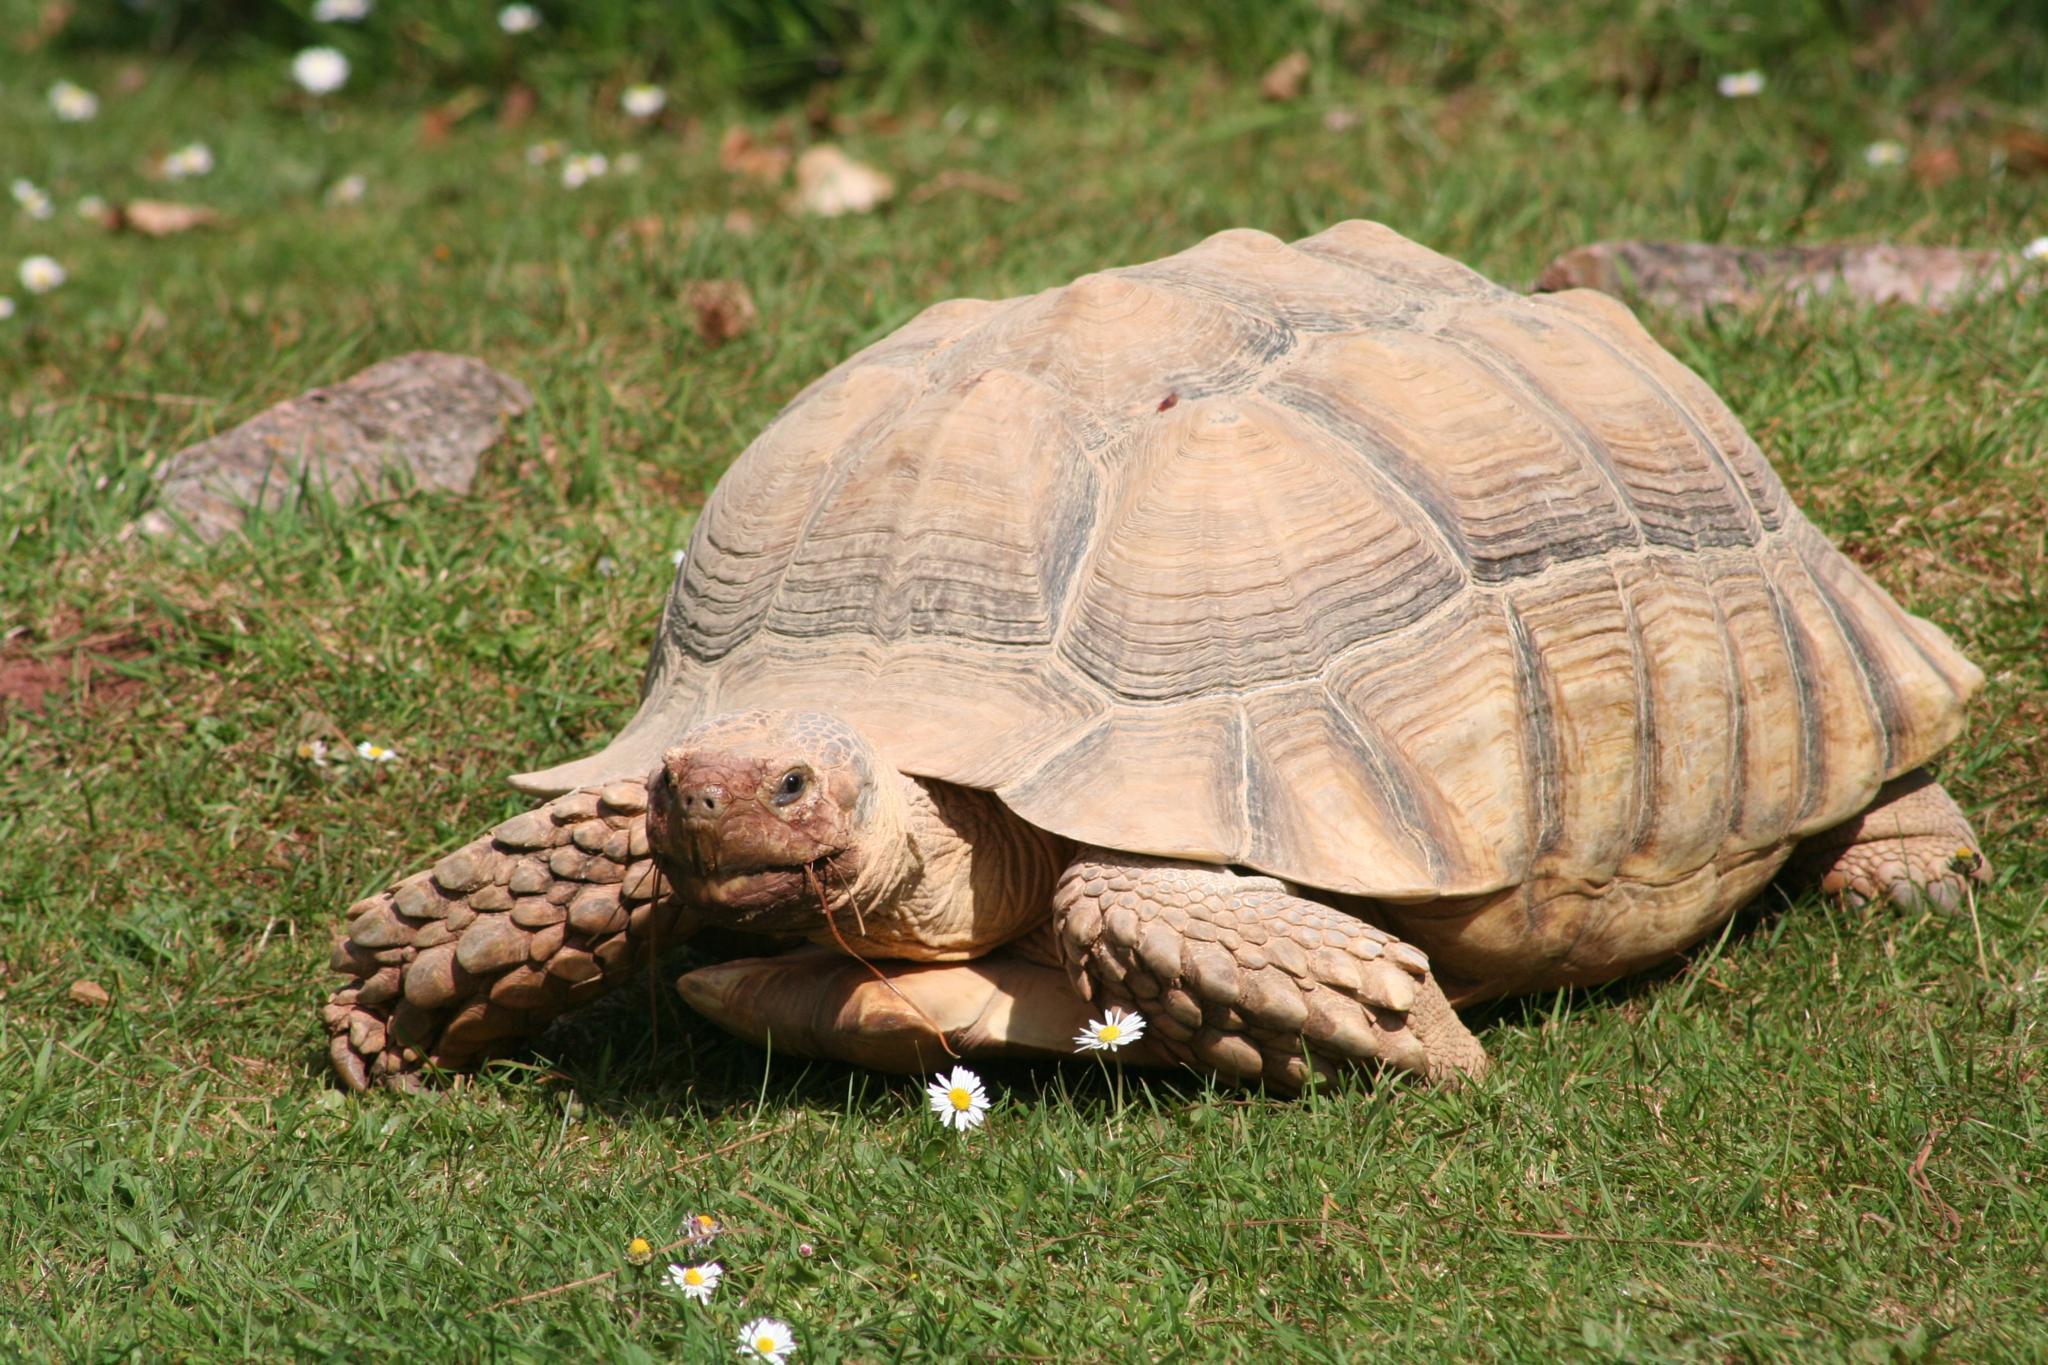 One big tortoise by Nige Photography